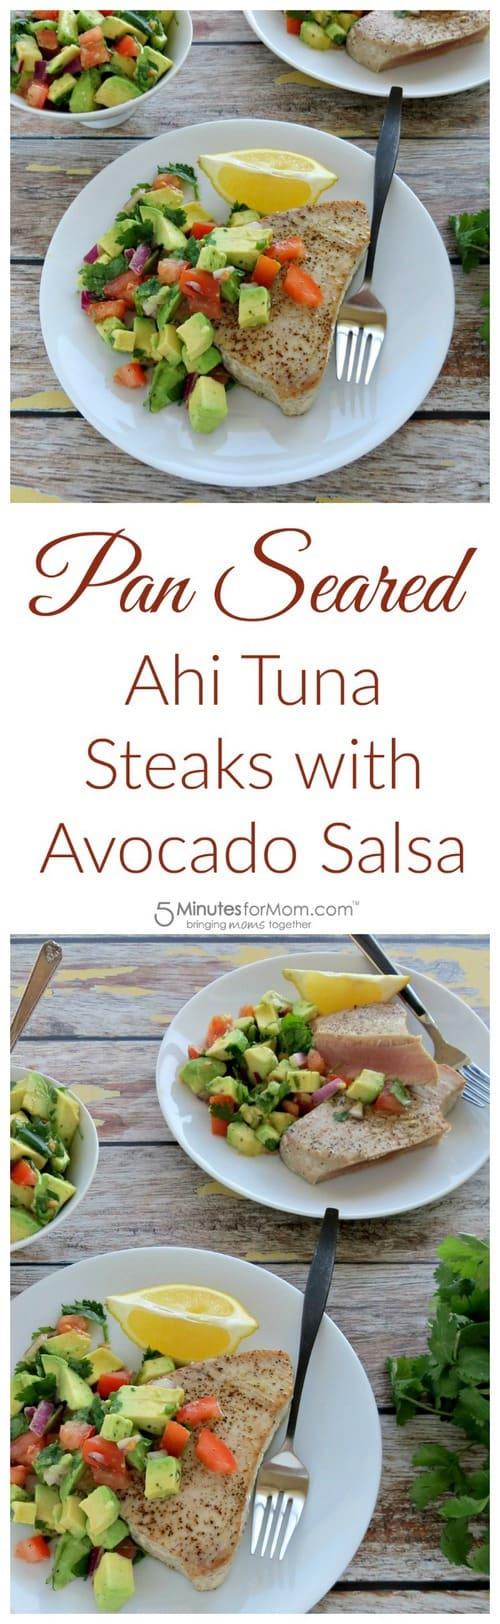 pan-seared-ahi-tuna-steaks-with-avocado-salsa